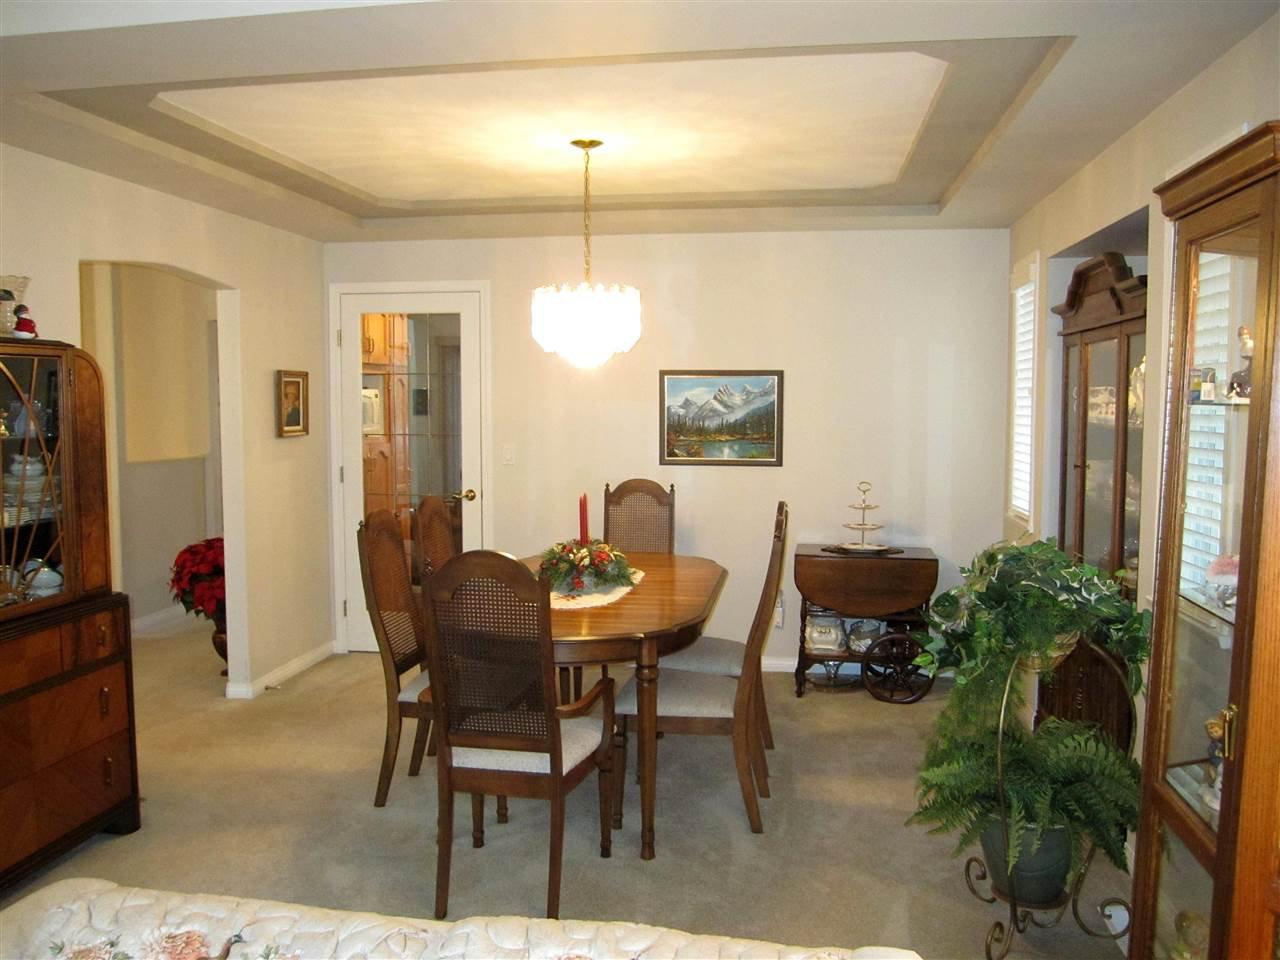 Photo 4: Photos: 23647 TAMARACK Lane in Maple Ridge: Albion House for sale : MLS®# R2019626